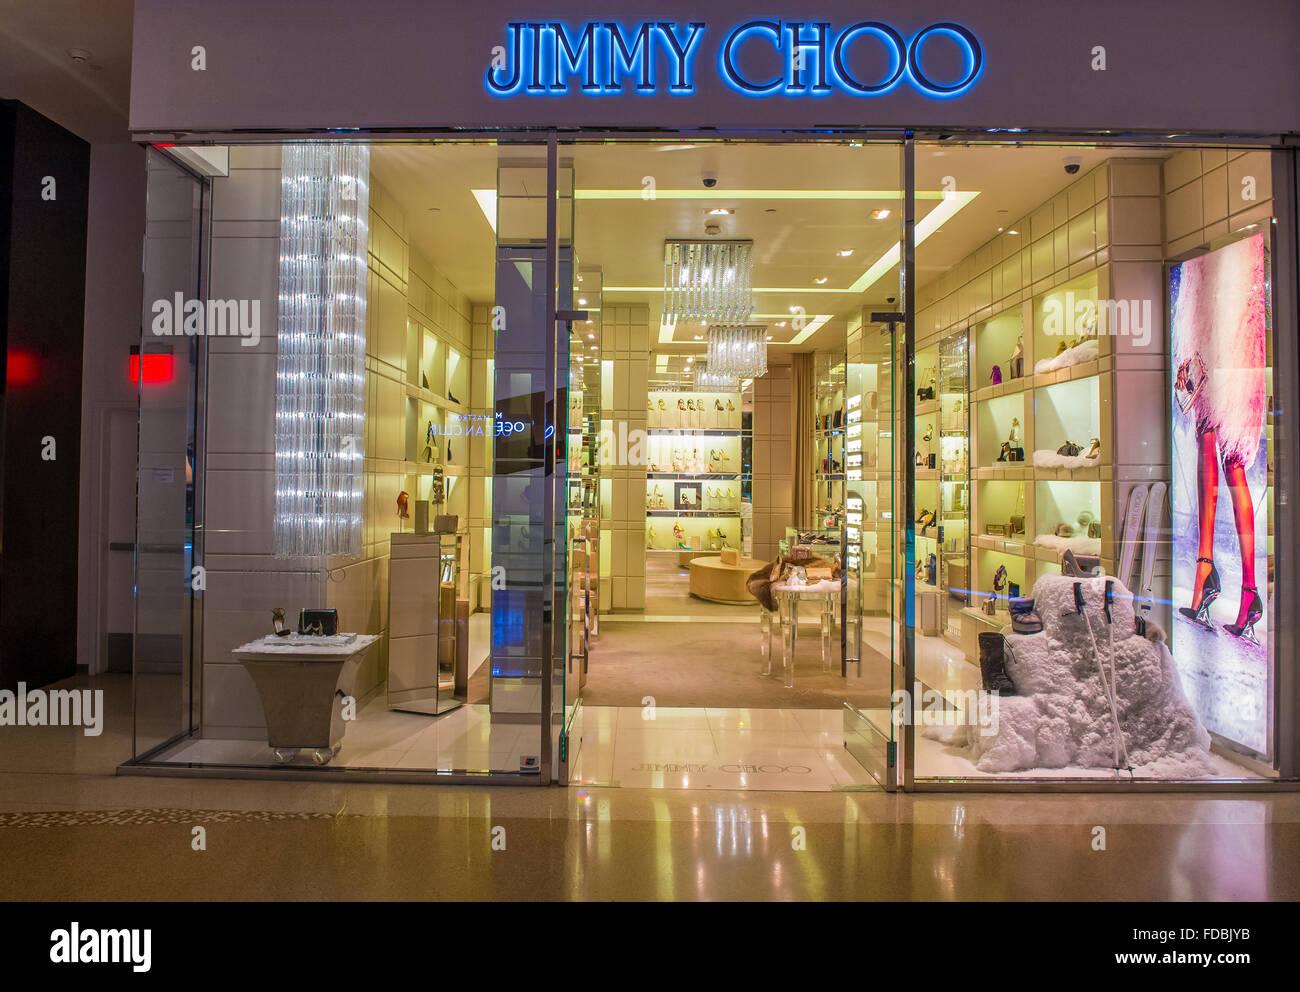 3a6e64d0d2e Exterior of a Jimmy Choo store in Las Vegas strip. - Stock Image